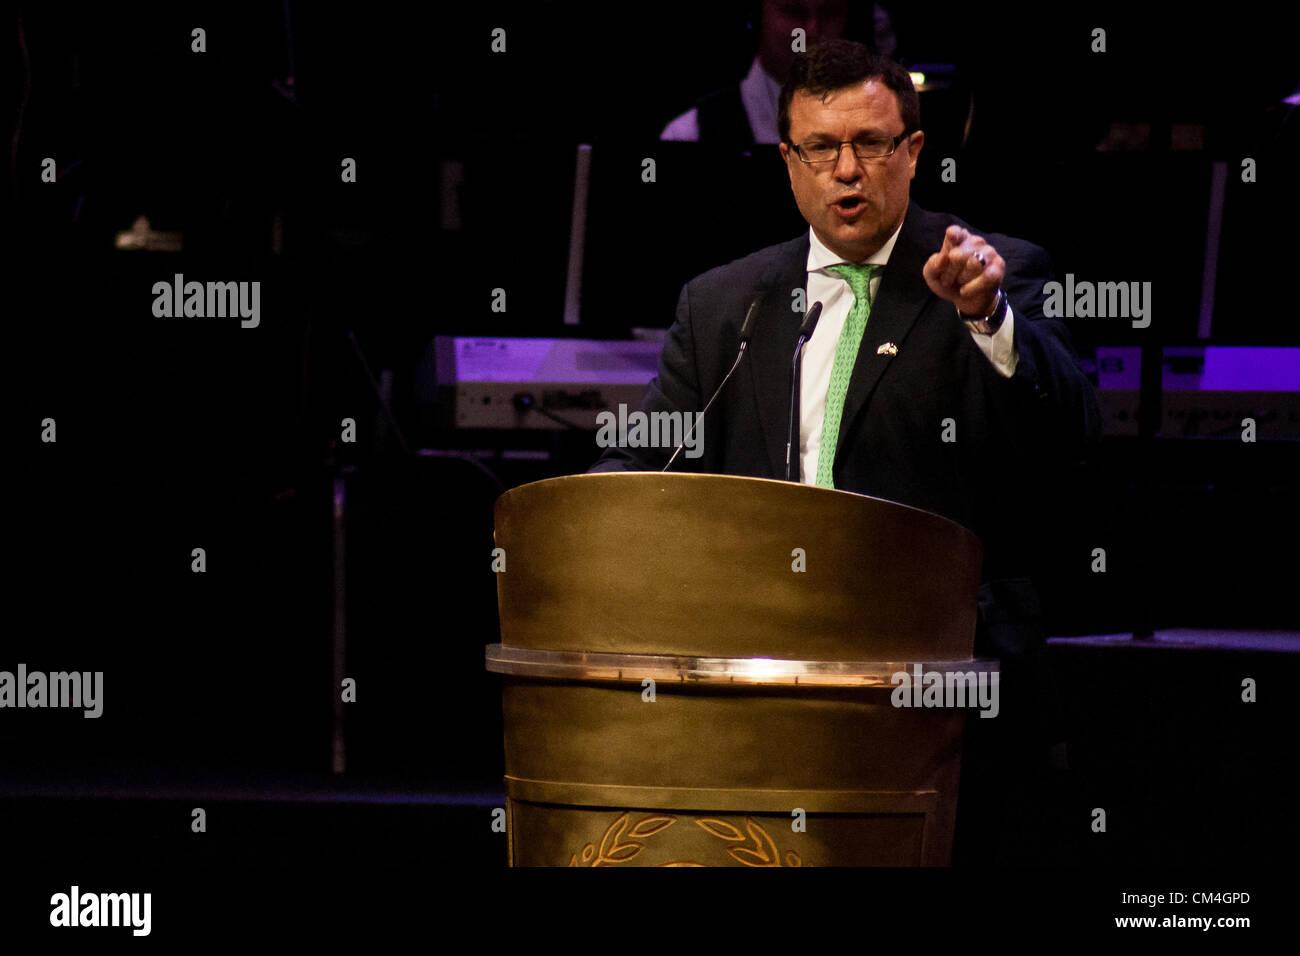 Dan Diker, Secretary-General of the World Jewish Congress, addresses thousands of Christians at an evening event Stock Photo